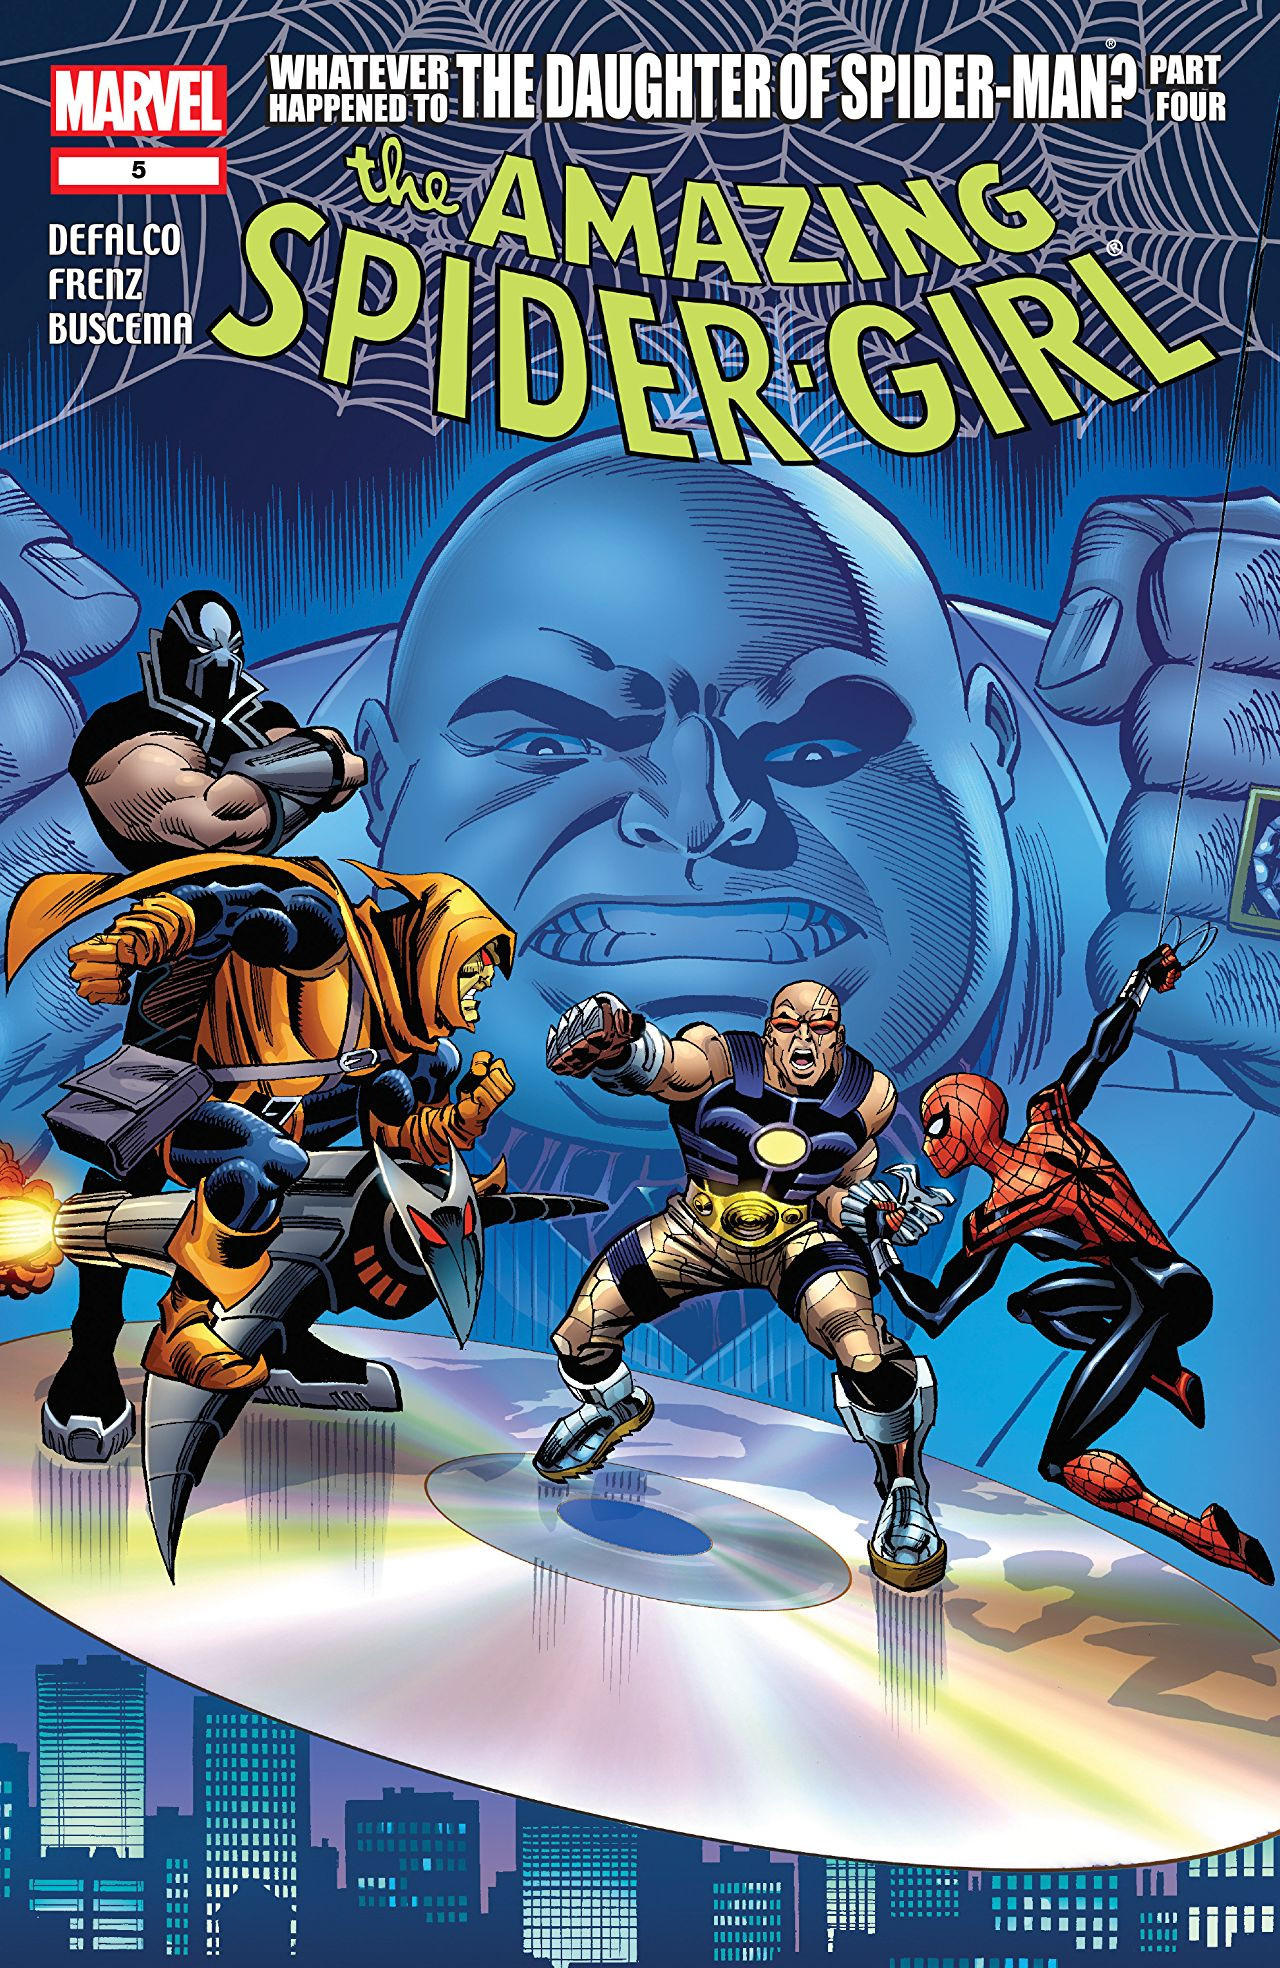 Amazing Spider-Girl Vol 1 5